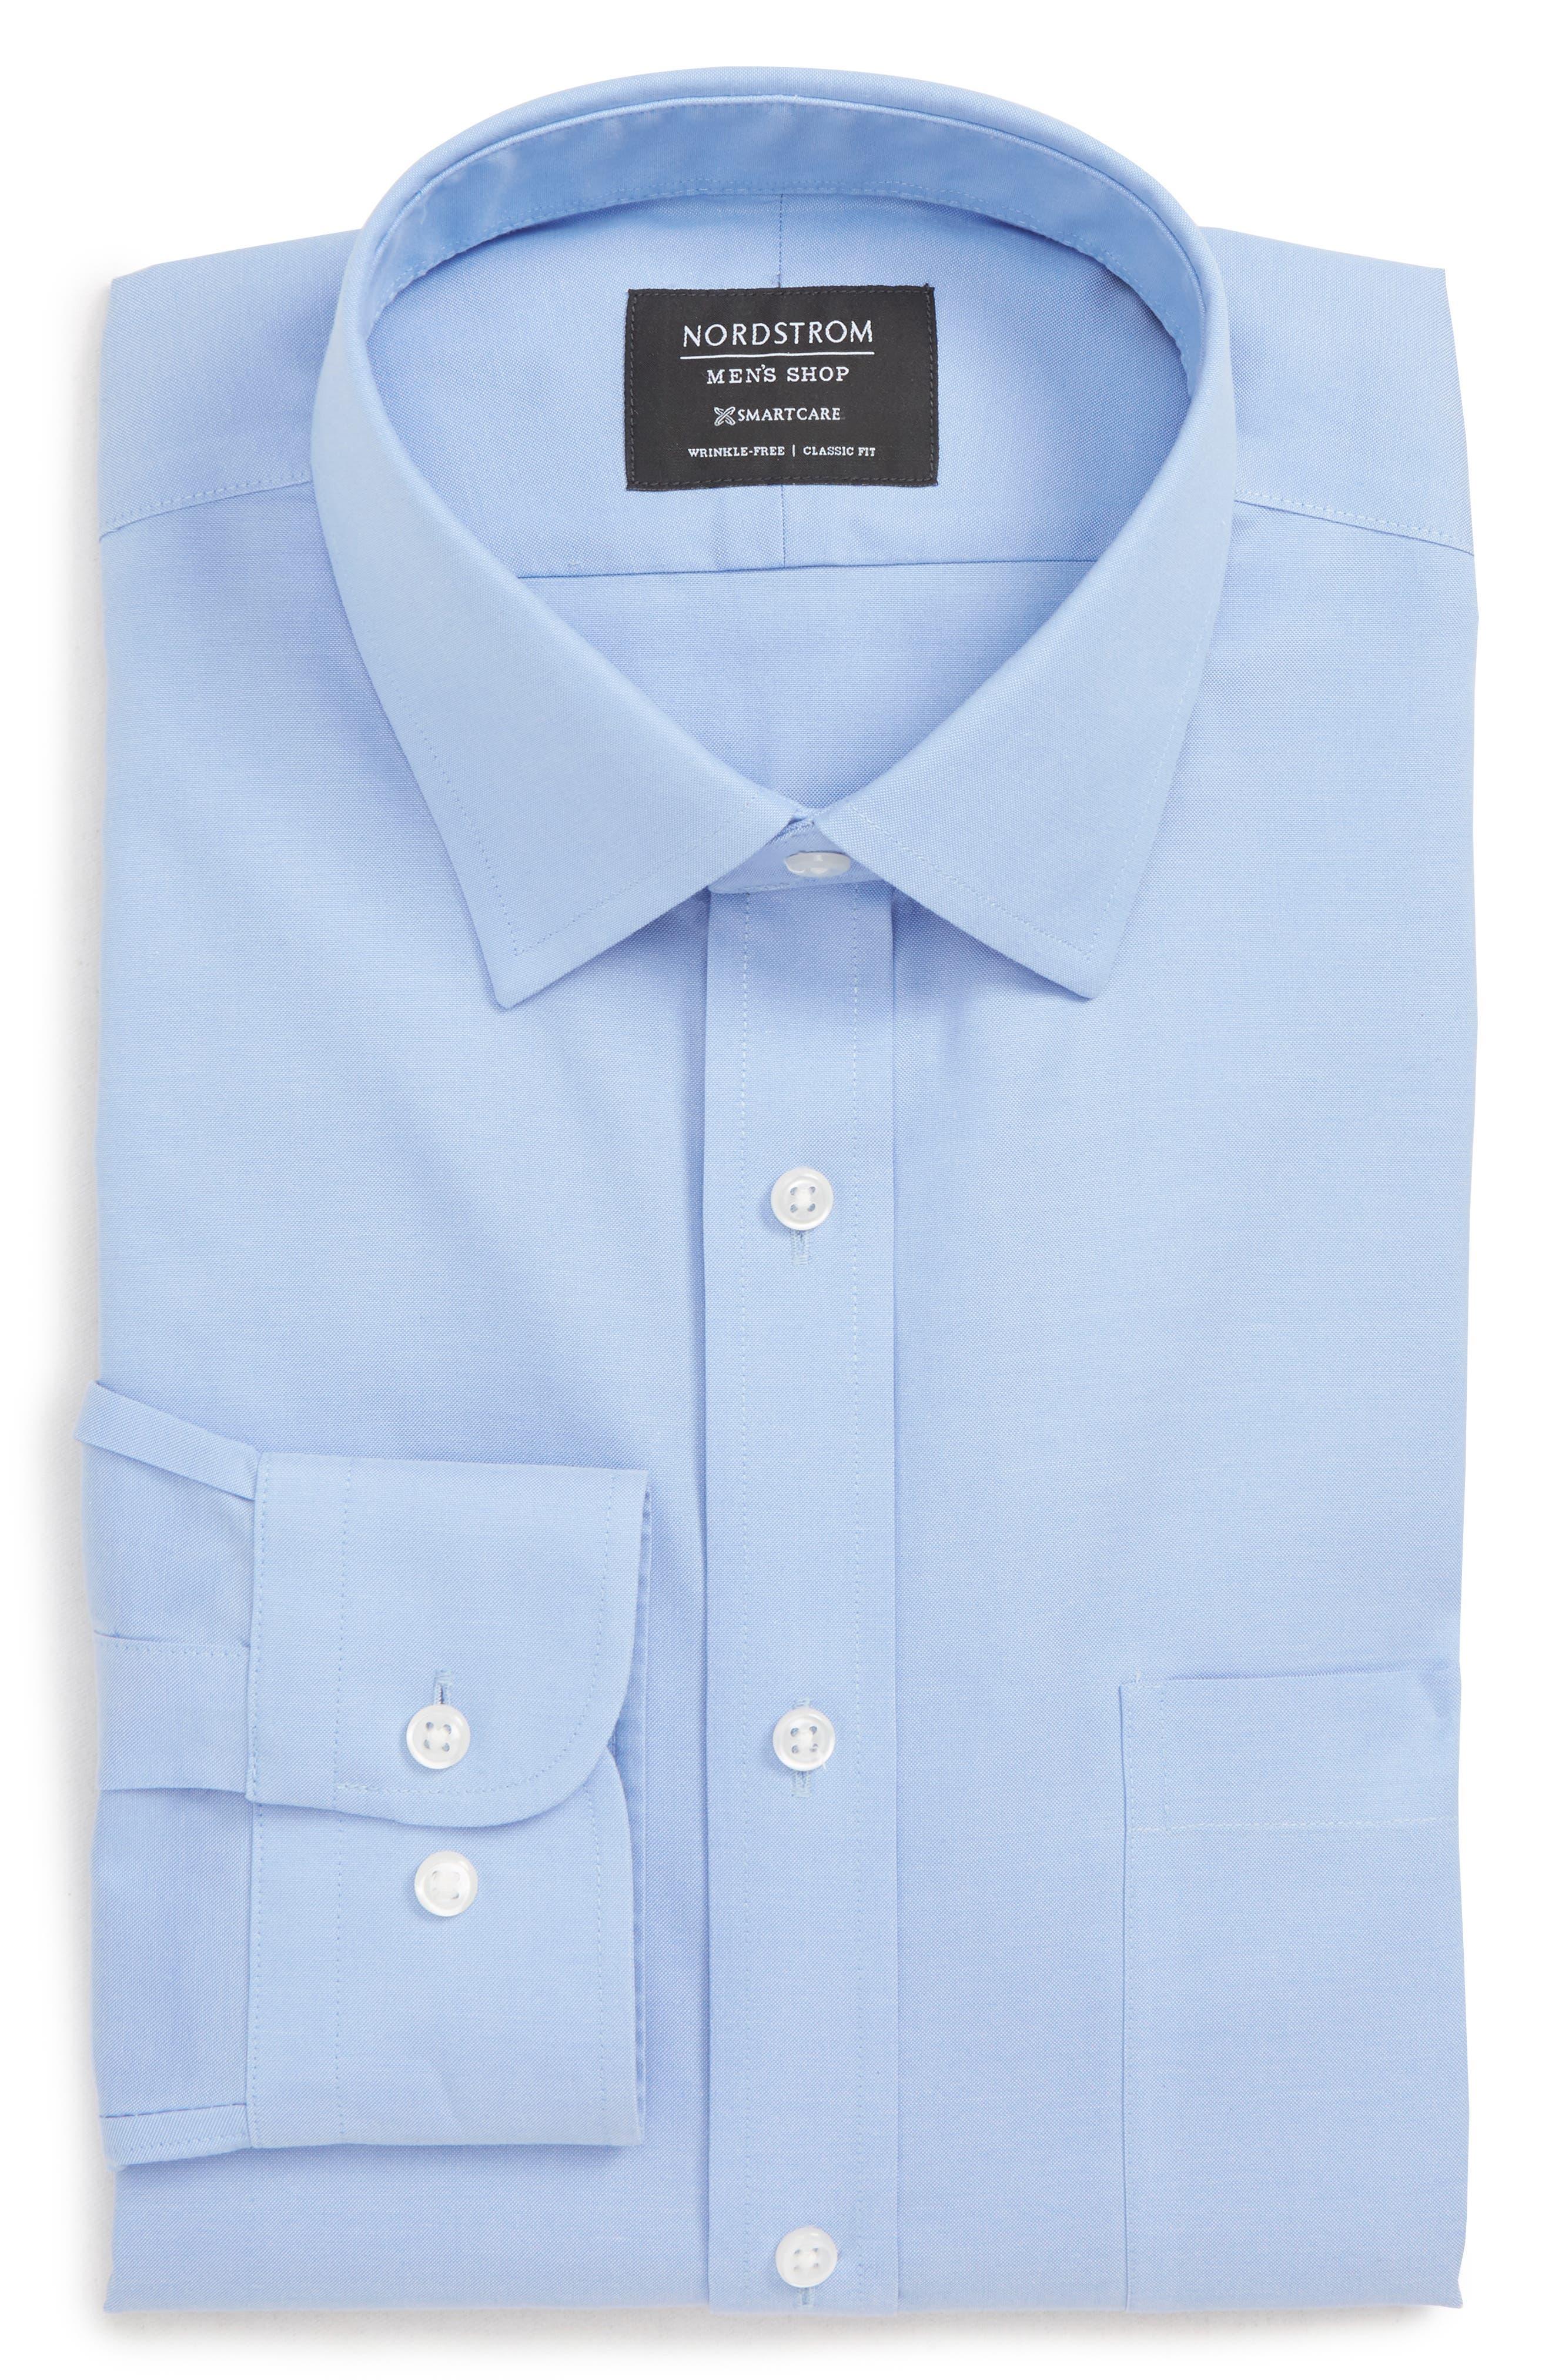 Nordstrom Shop Smartcare(TM) Classic Fit Solid Dress Shirt 32/33 - Blue